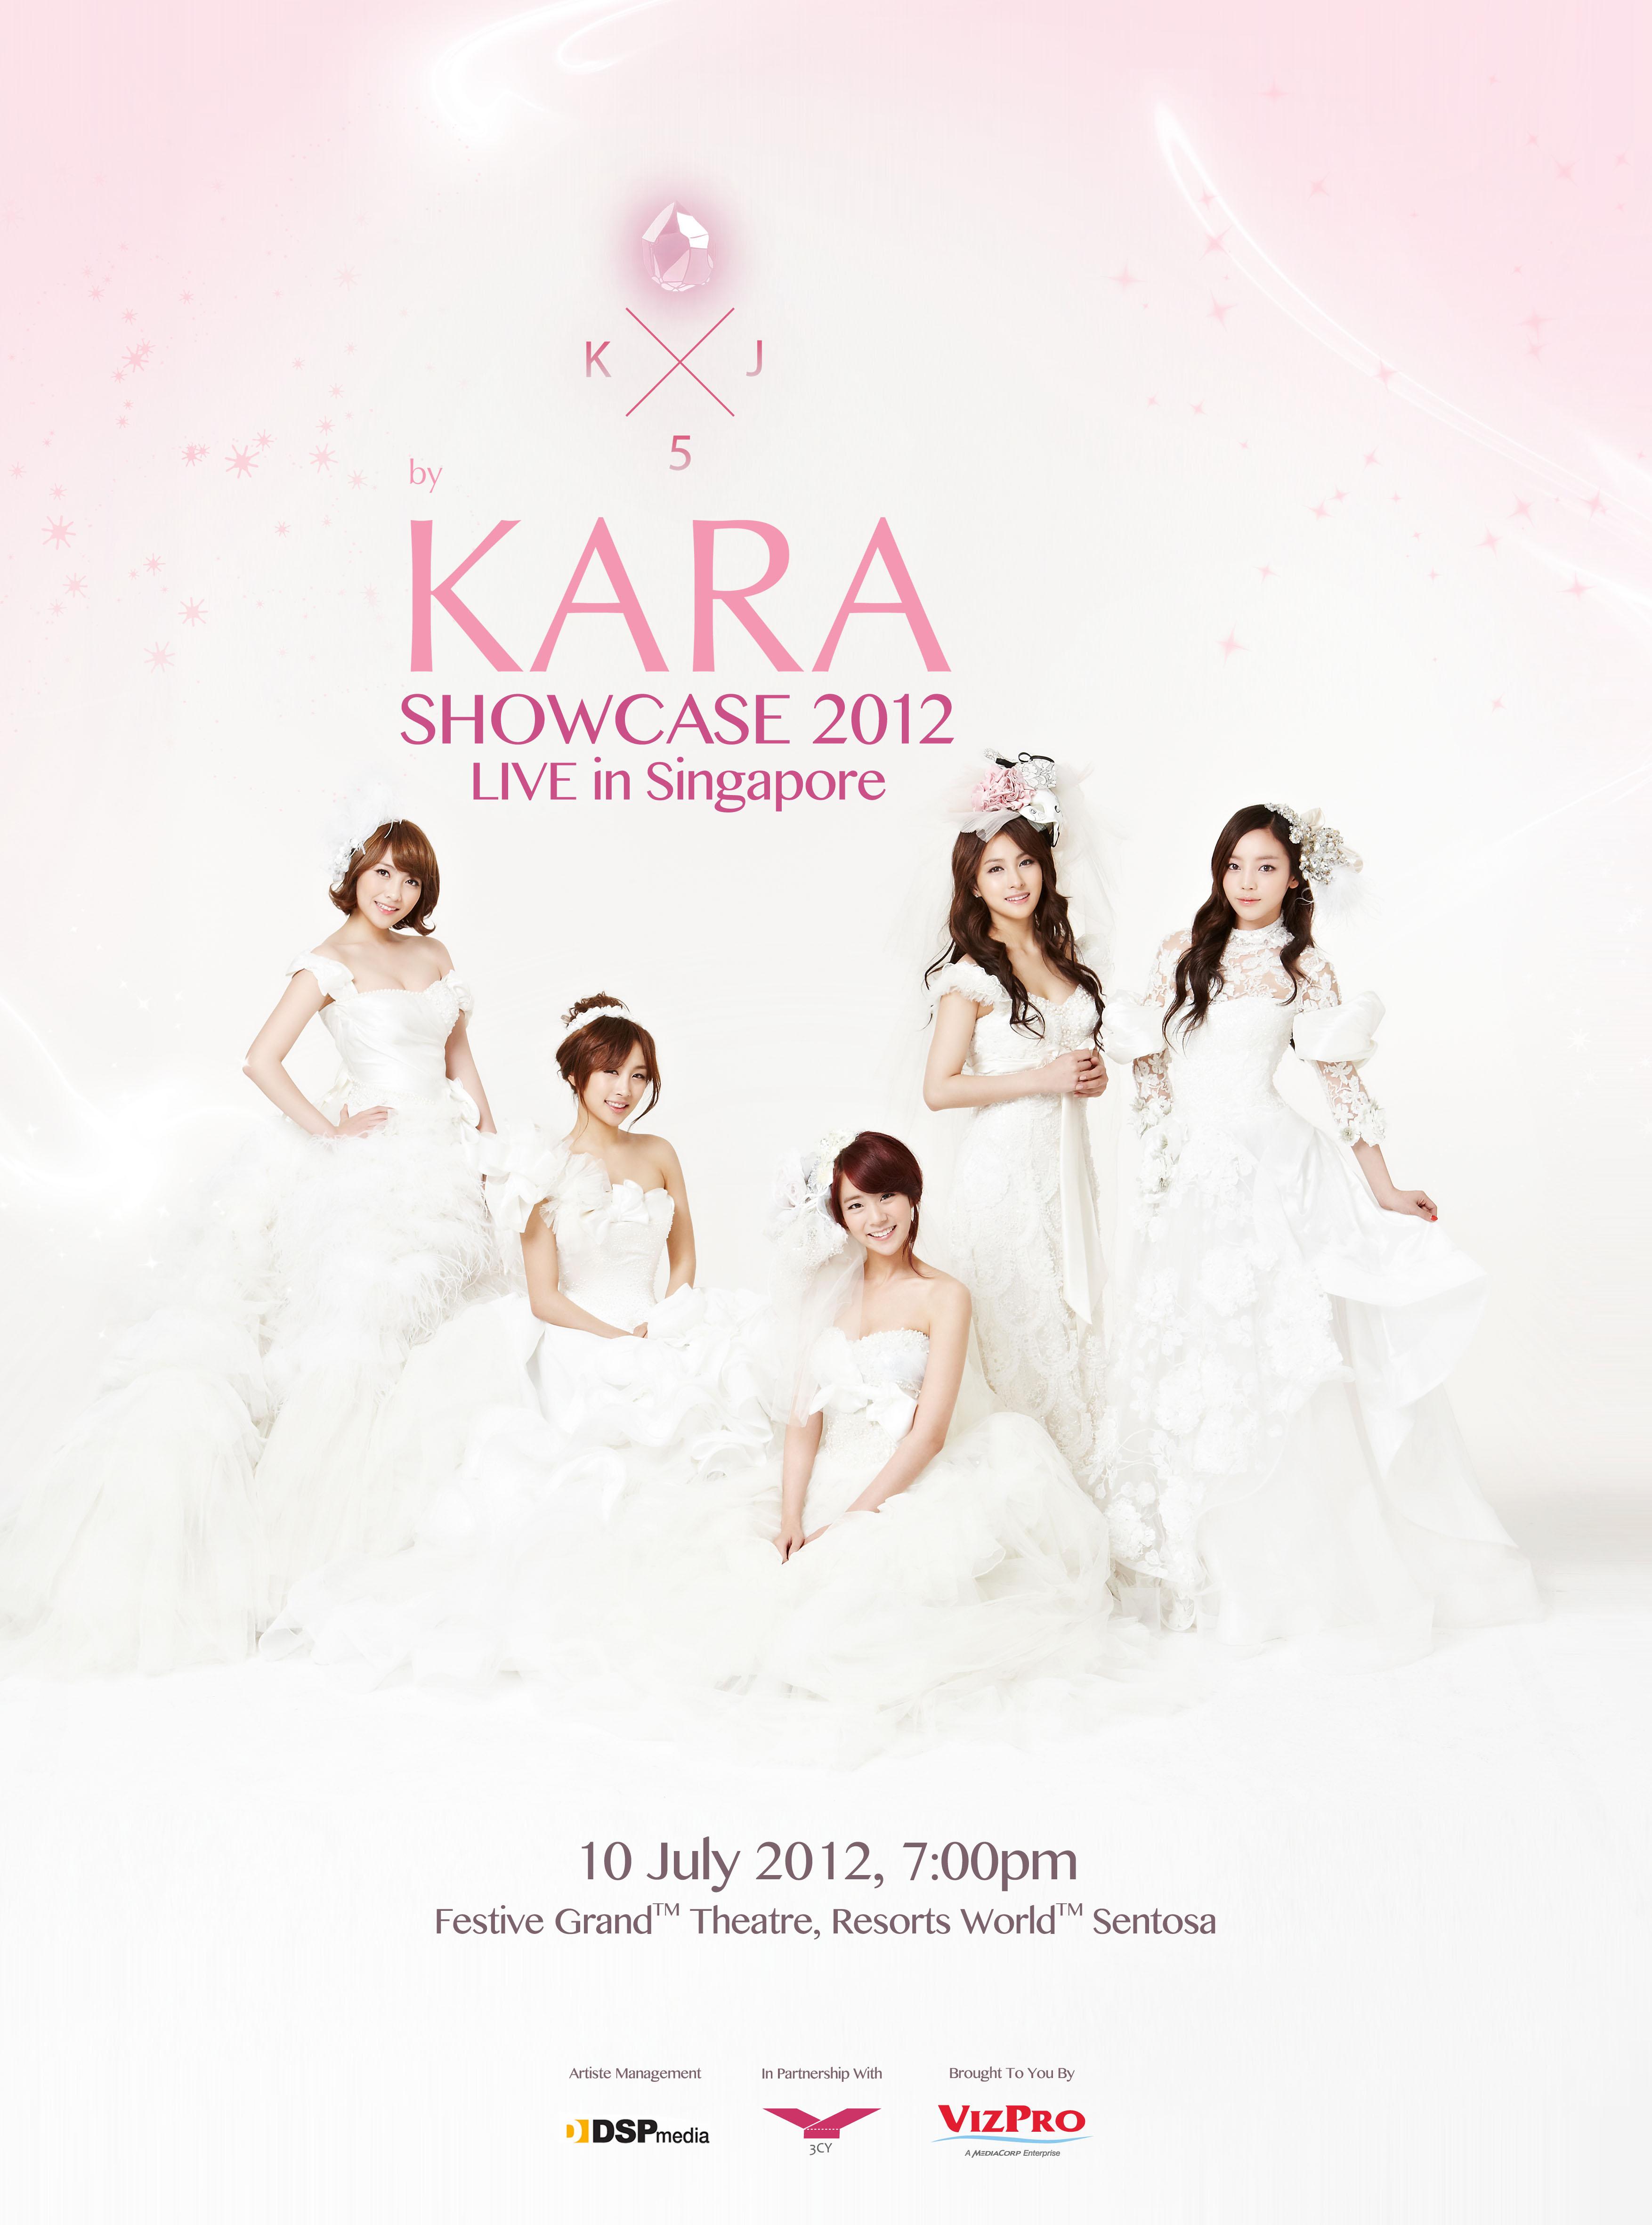 KARA to Hold Showcase in Singapore